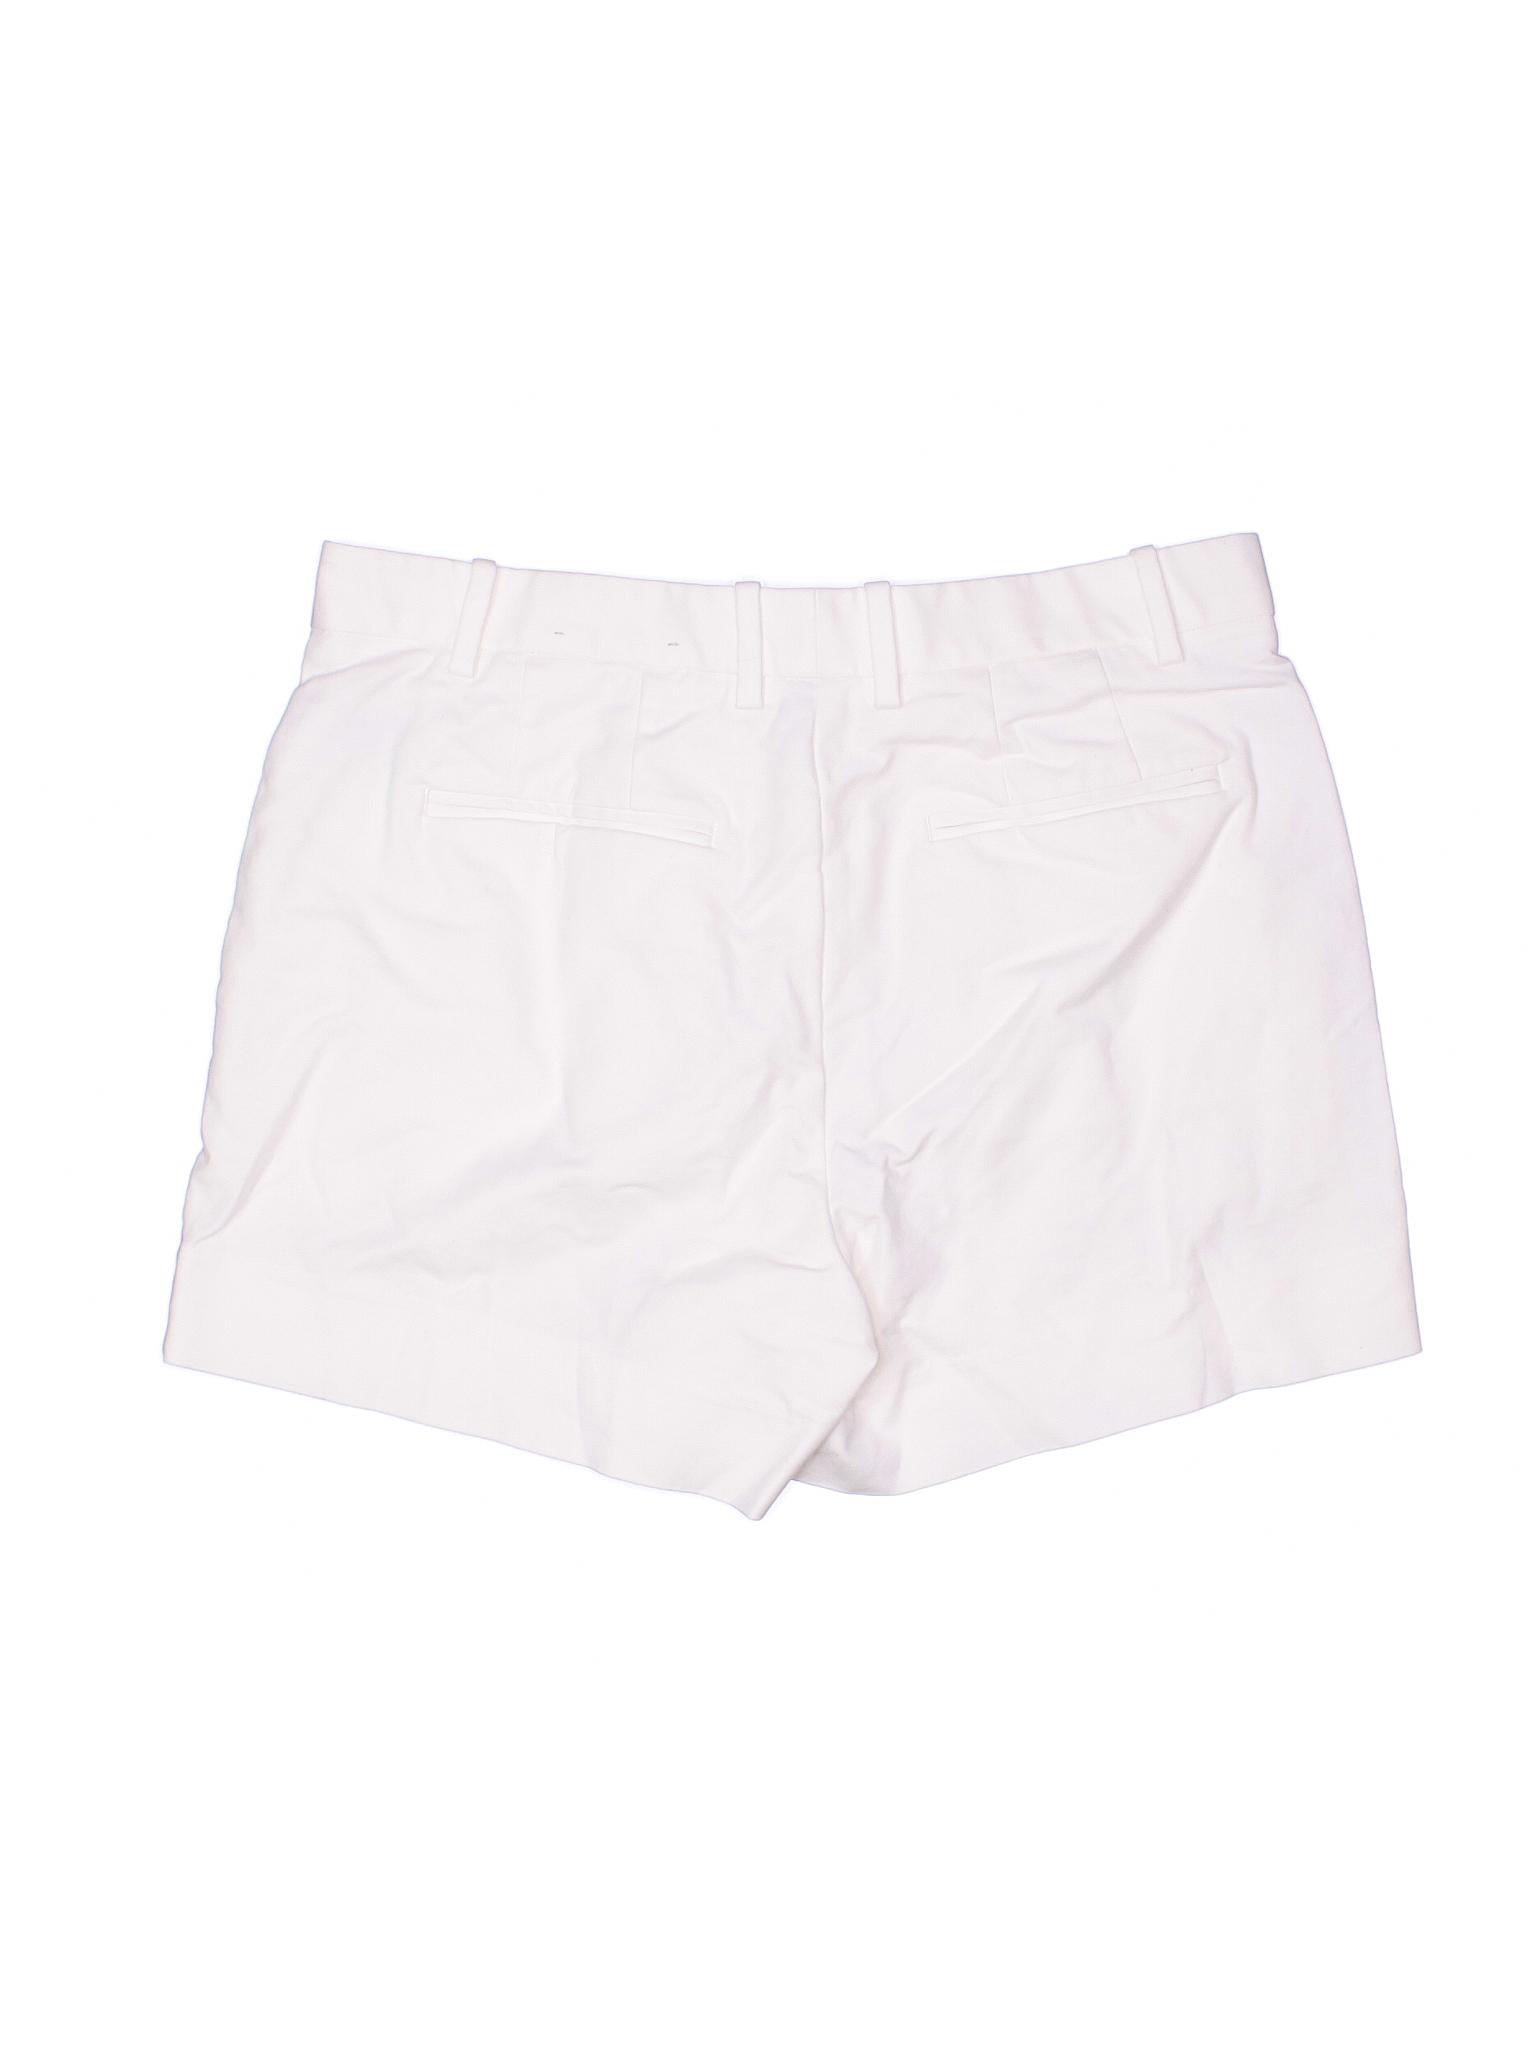 Gap Shorts Gap Gap Boutique Gap Khaki Khaki Boutique Boutique Boutique Khaki Khaki Shorts Shorts WYd68RnfY